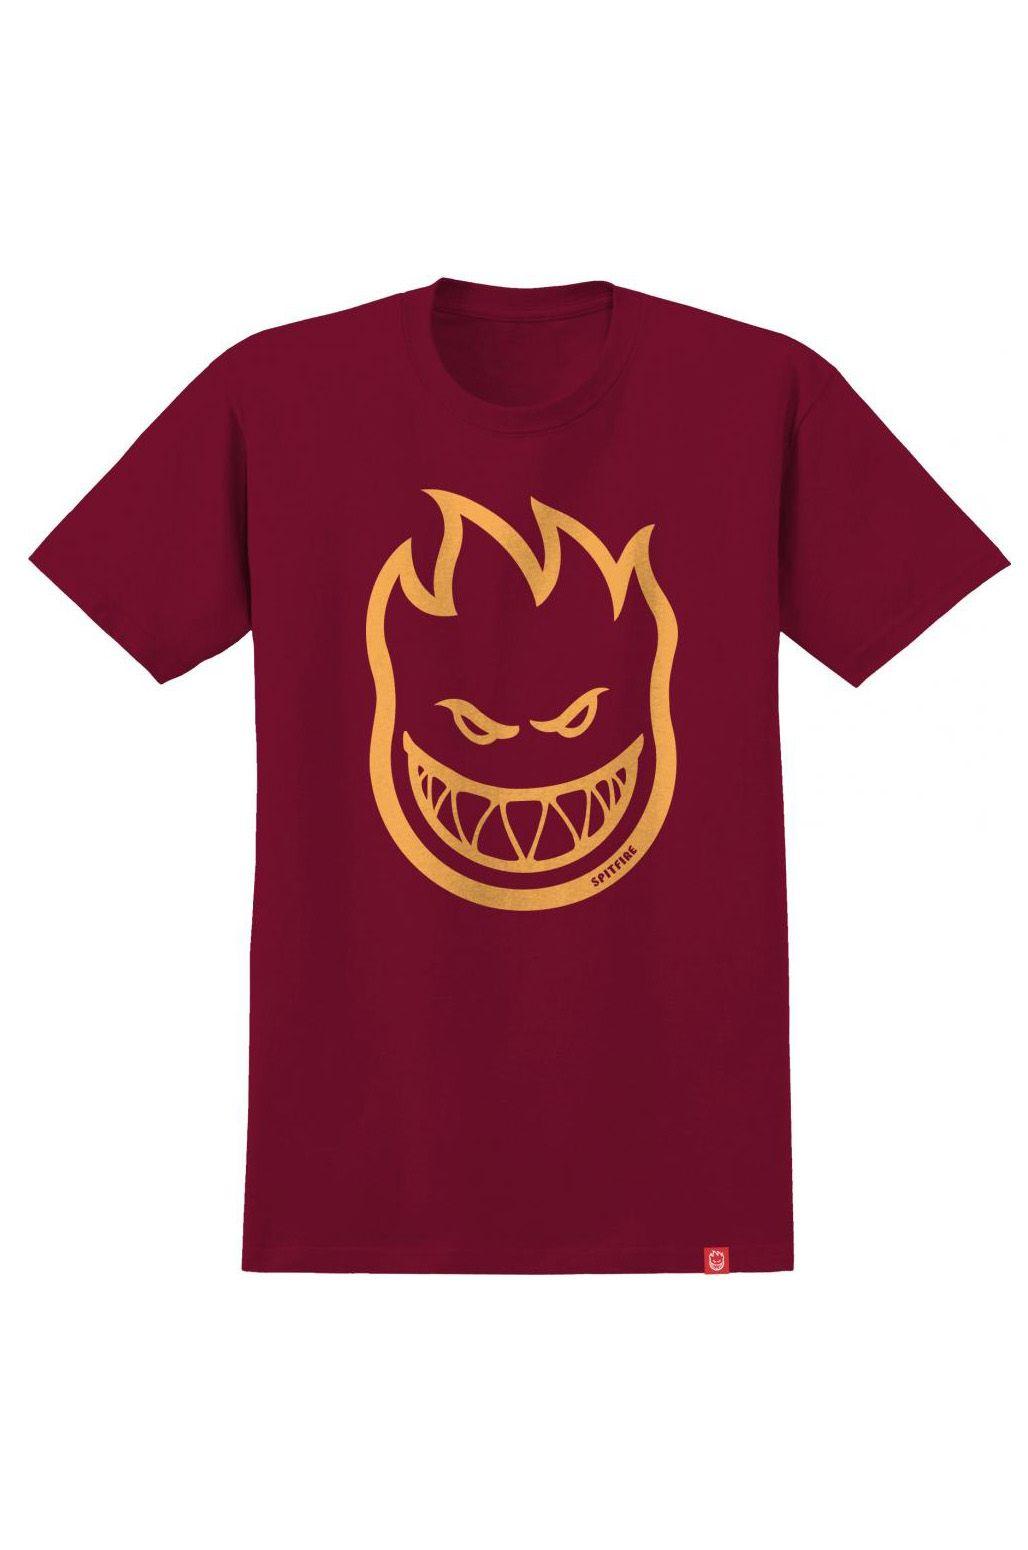 T-Shirt Spitfire BIGHEAD Cardinal/Orange